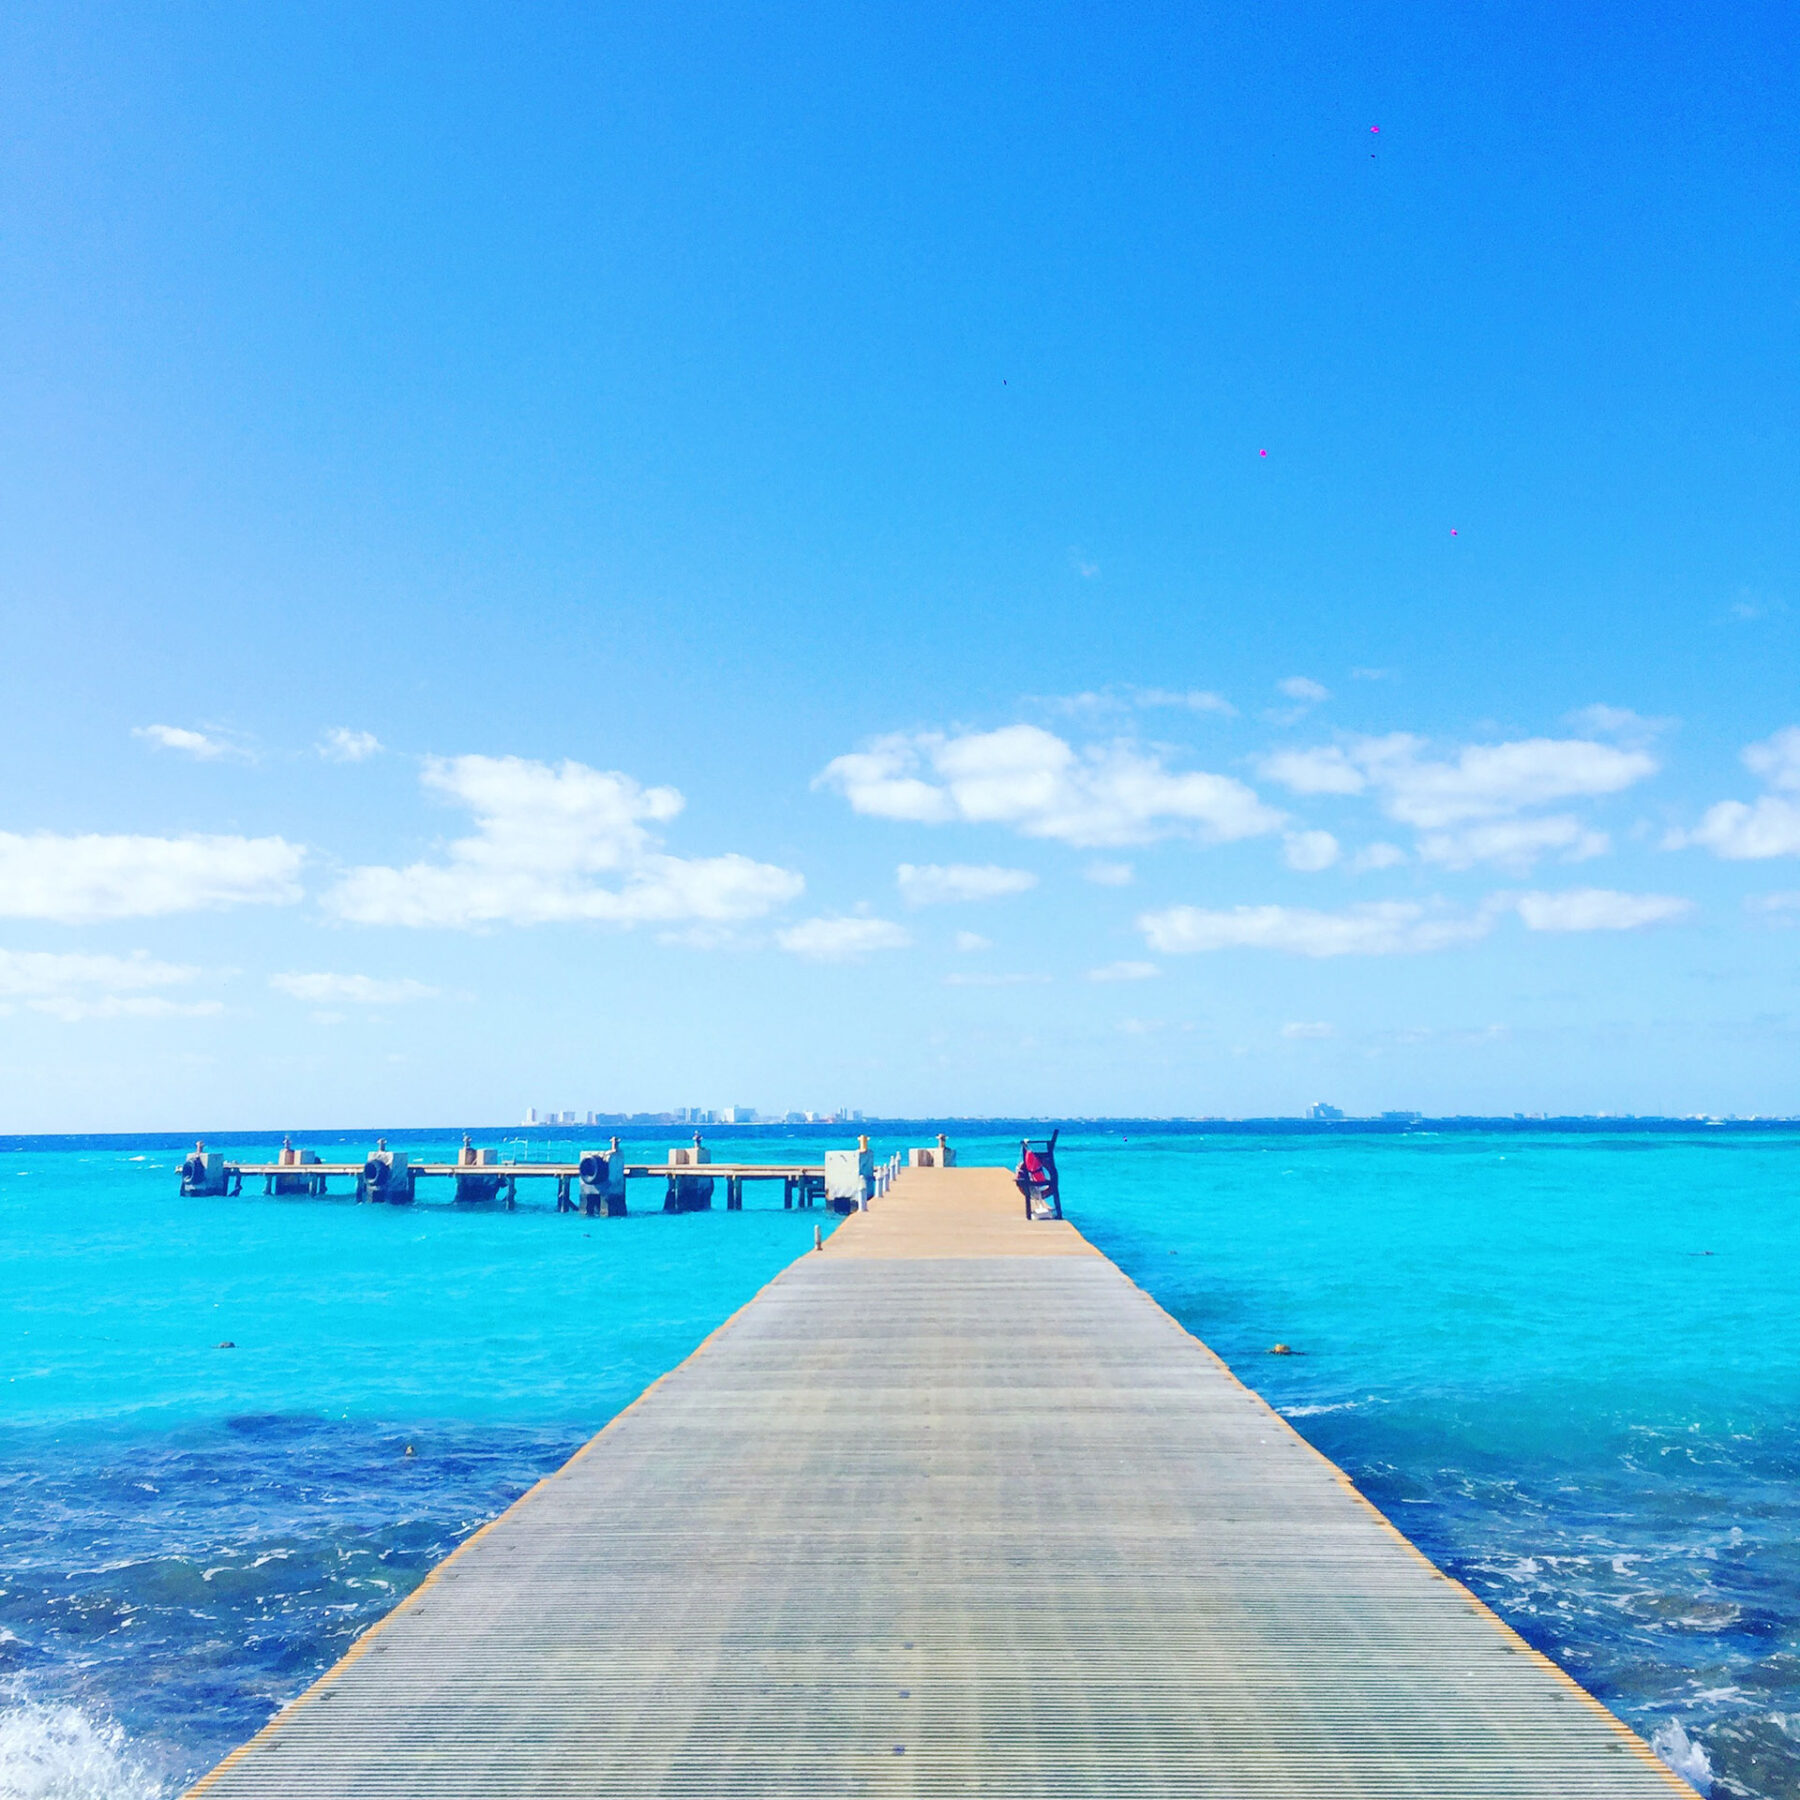 Mar azul do parque Garrafon em Isla Mujeres, Cancún